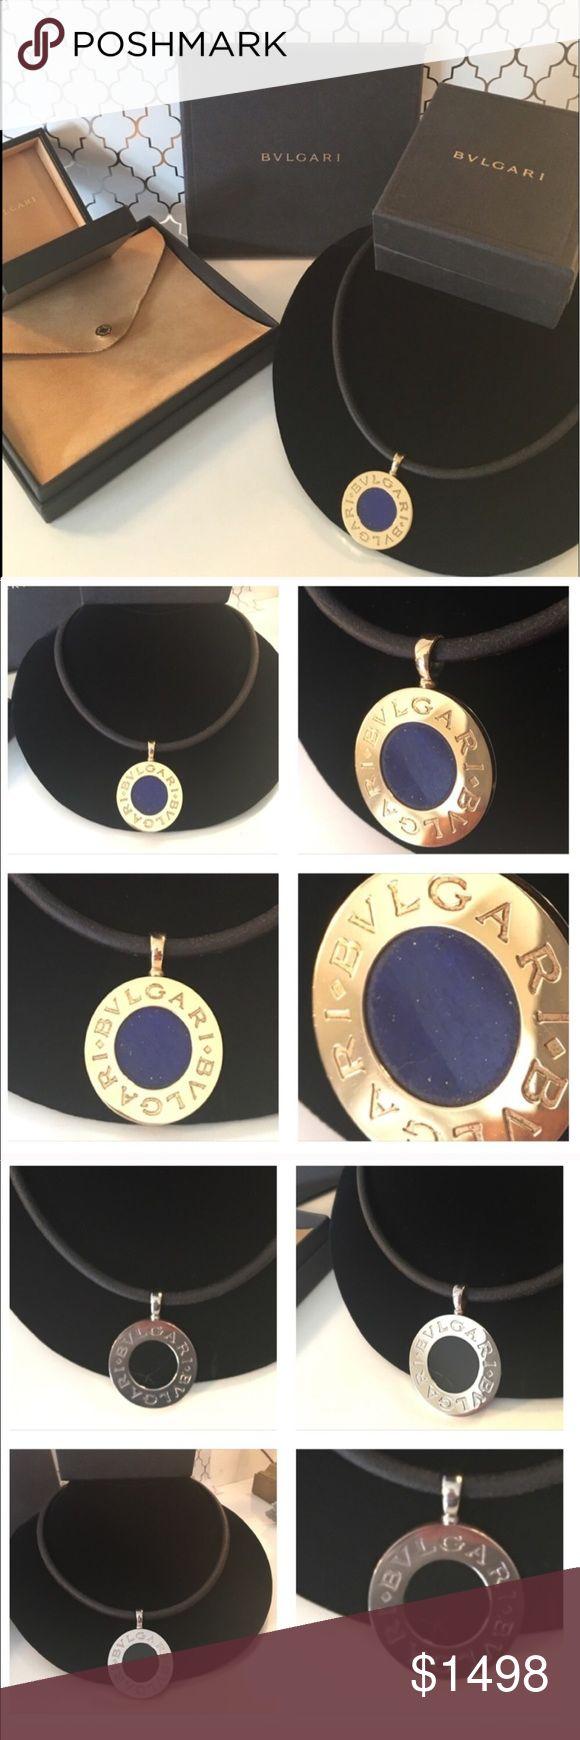 5011b9f6fc5 Spotted while shopping on Poshmark  ⭐️BULGARI 18kt GOLD PENDANT  NECKLACE  💯AUTHENTIC!  poshmark  fashion  shopping  style  Bulgari  Jewelry